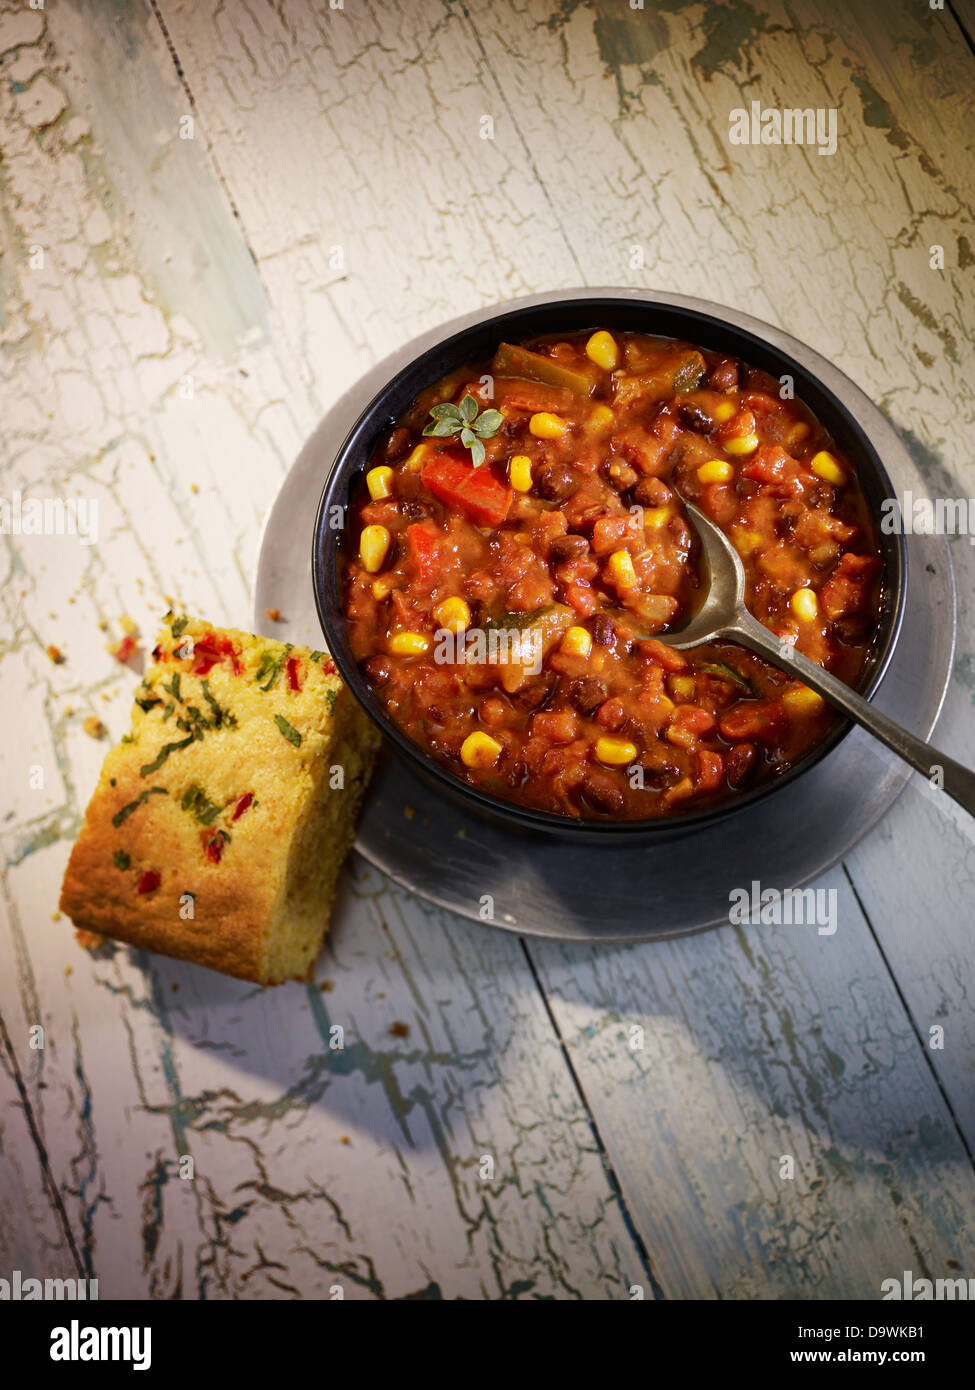 chili beans - Stock Image